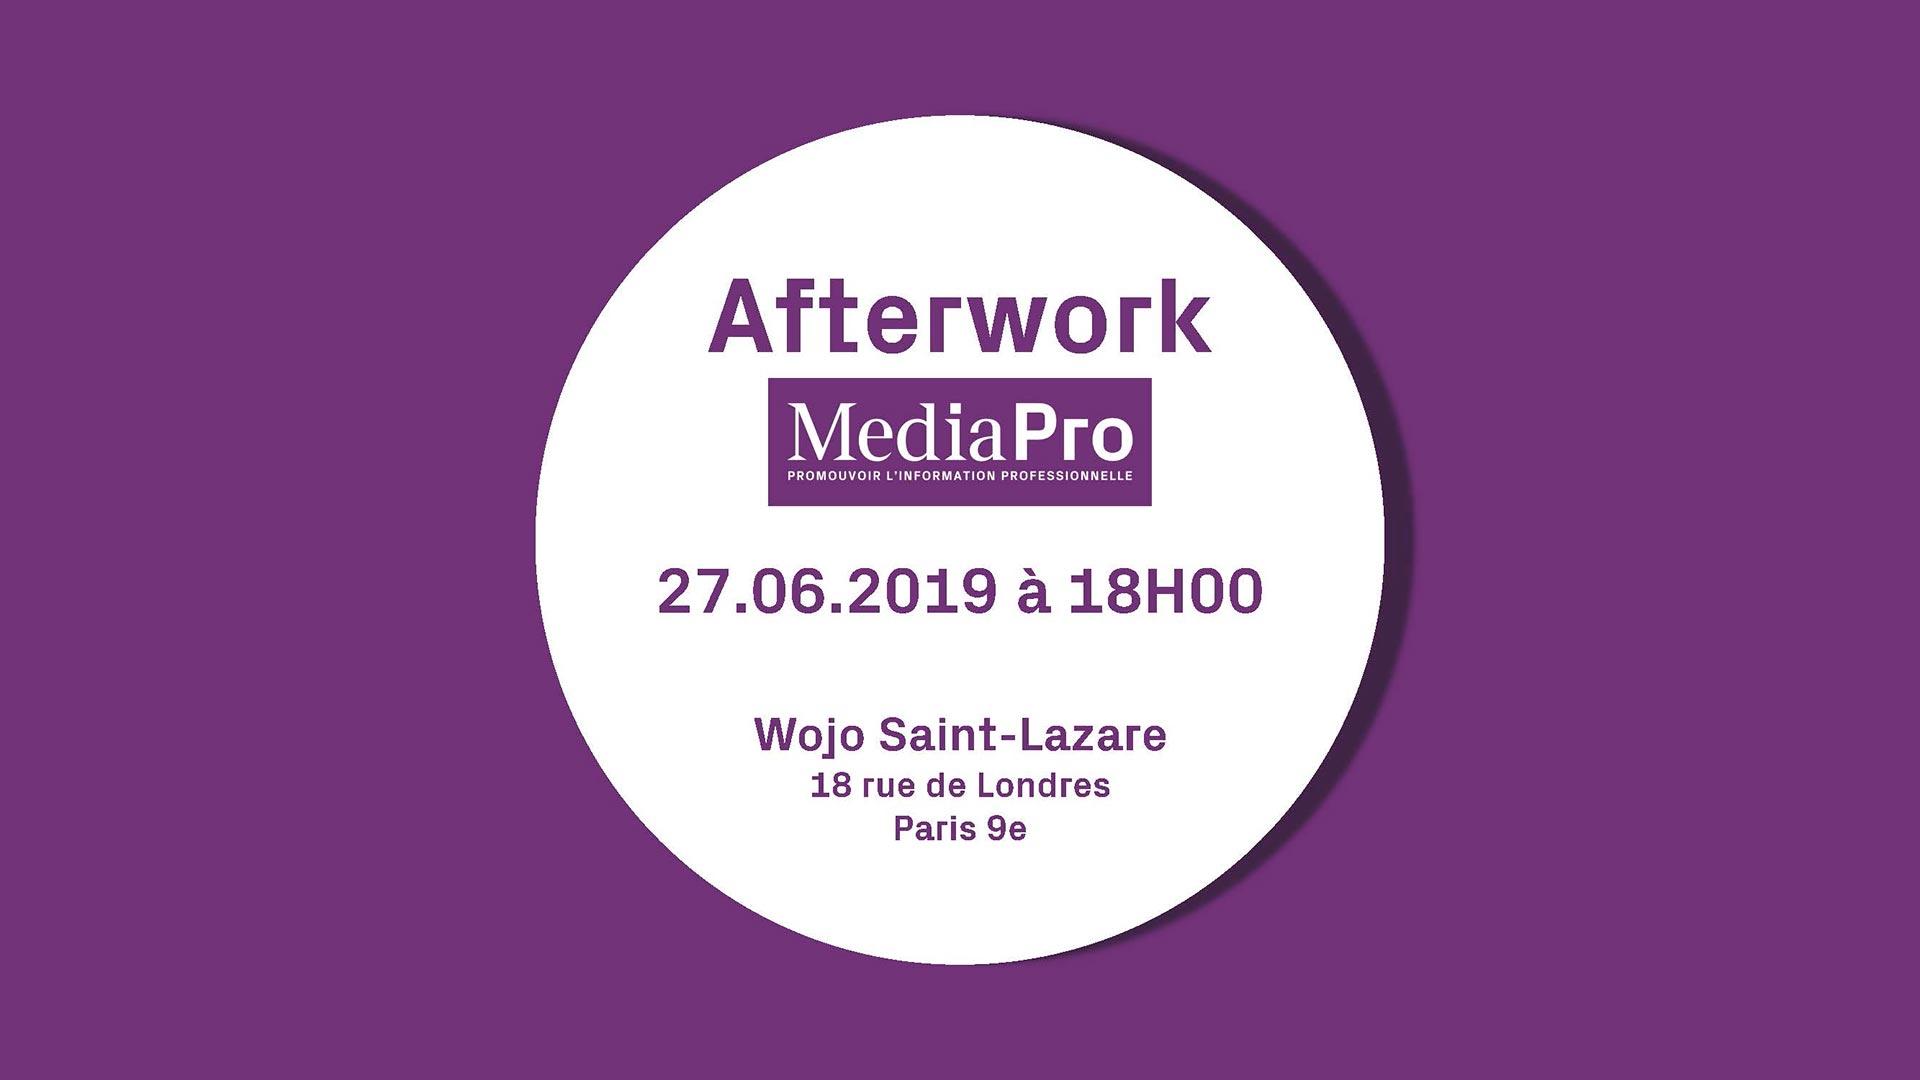 Succès du premier Afterwork MediaPro